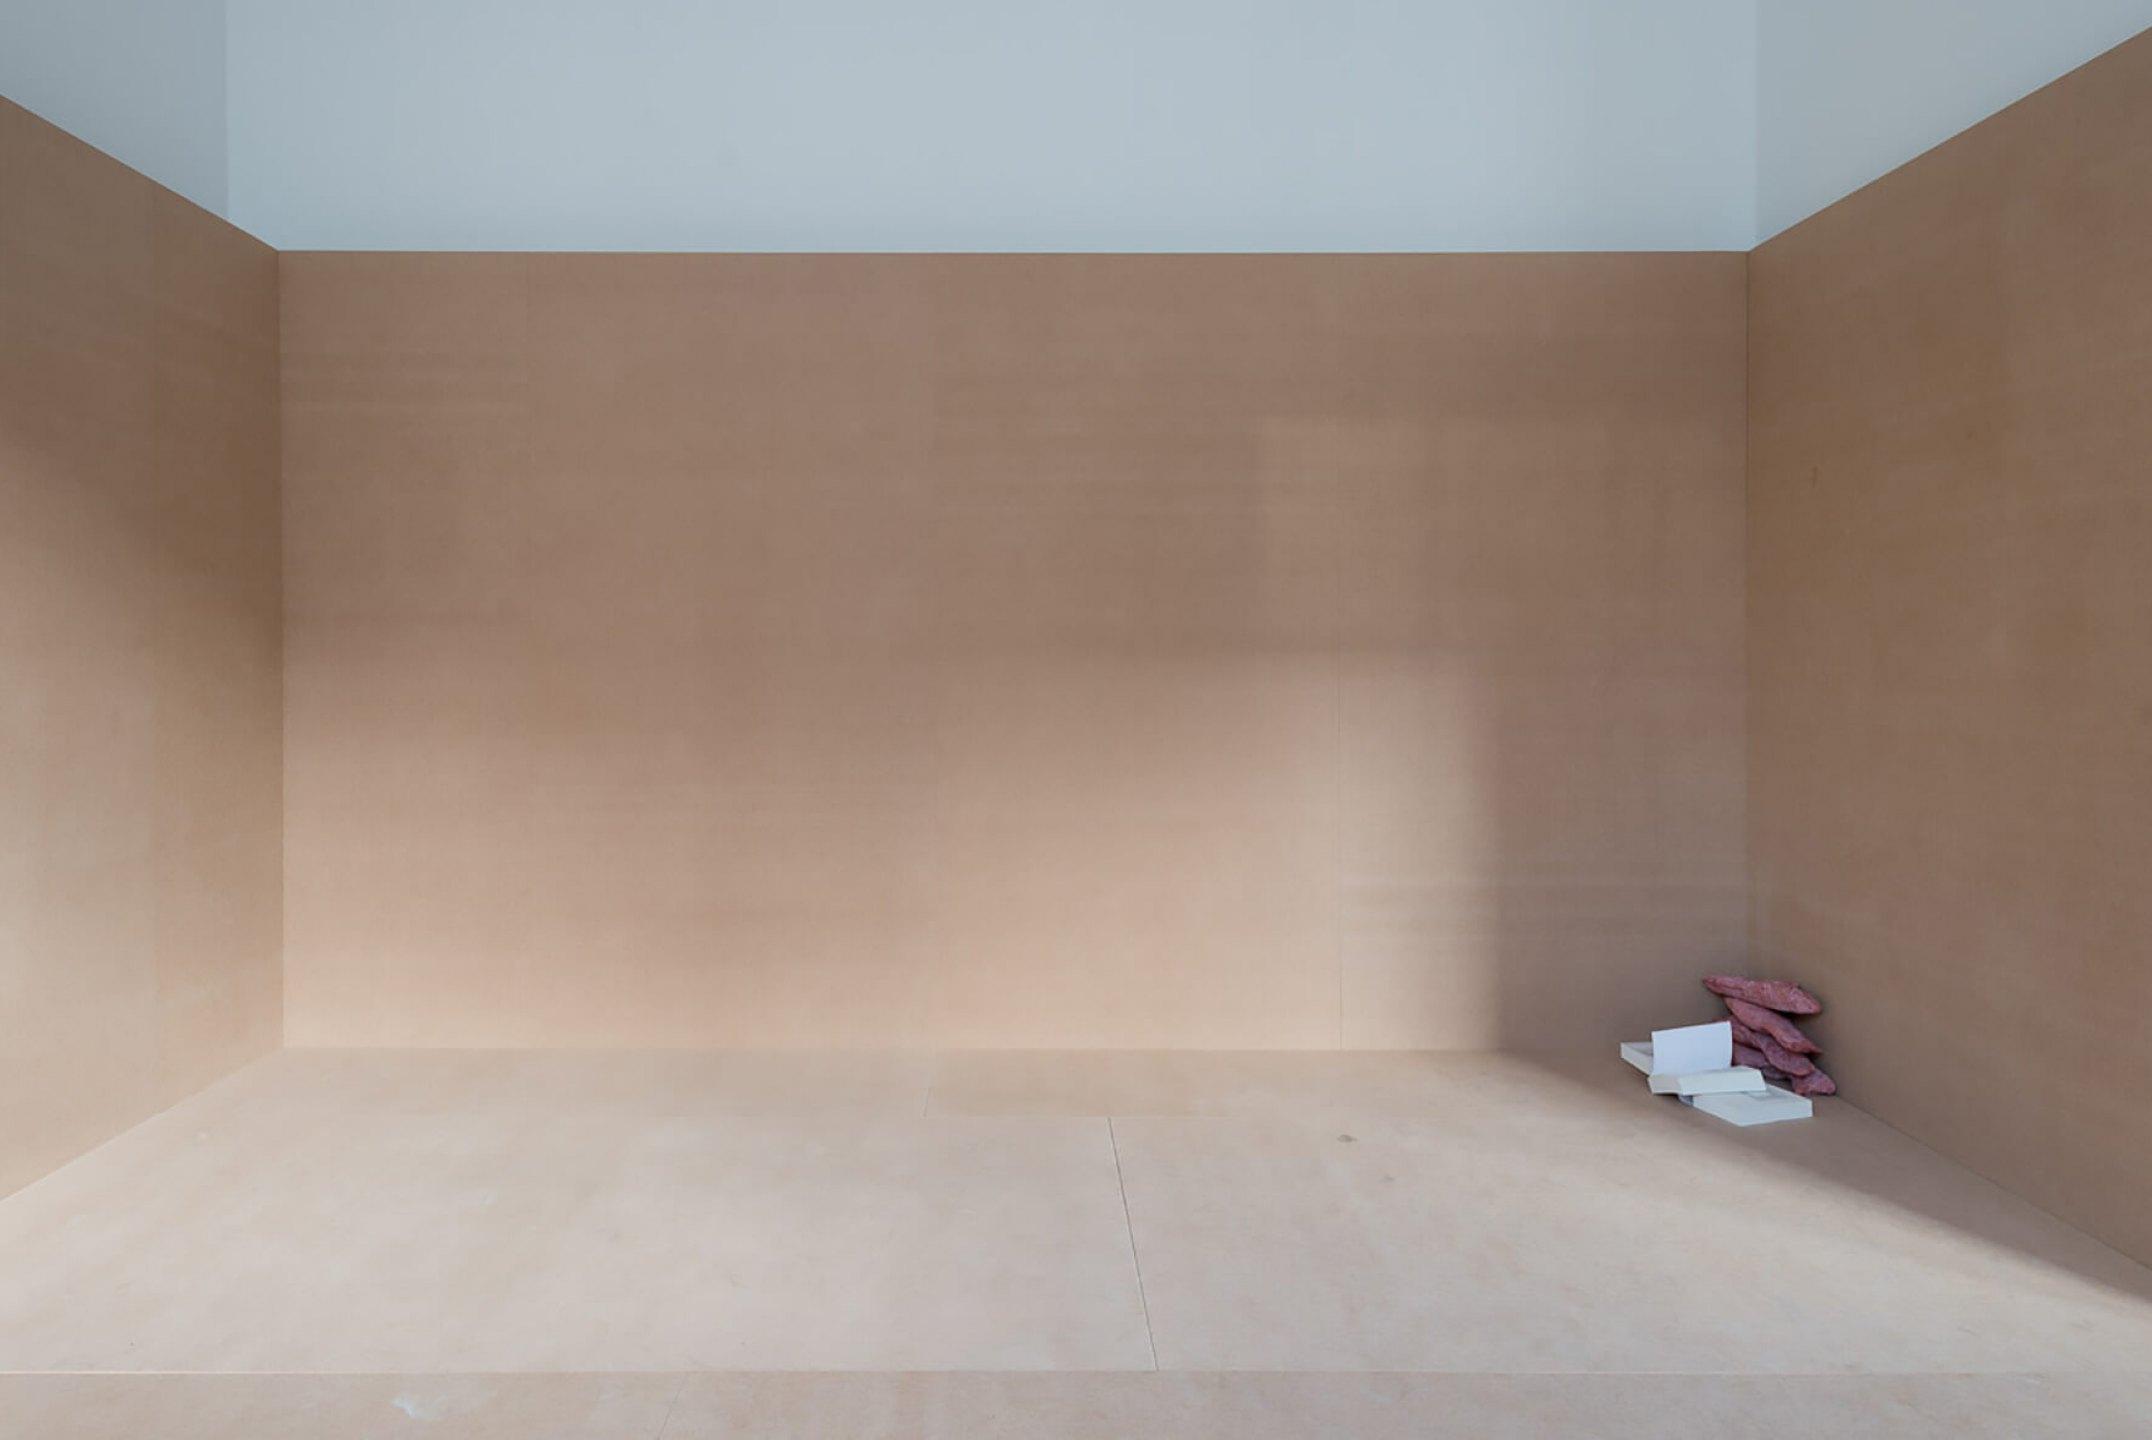 Michael Dean,<em>Qualities of Violence</em>, De Appel Arts Centre, Amsterdam, 2015 - Mendes Wood DM